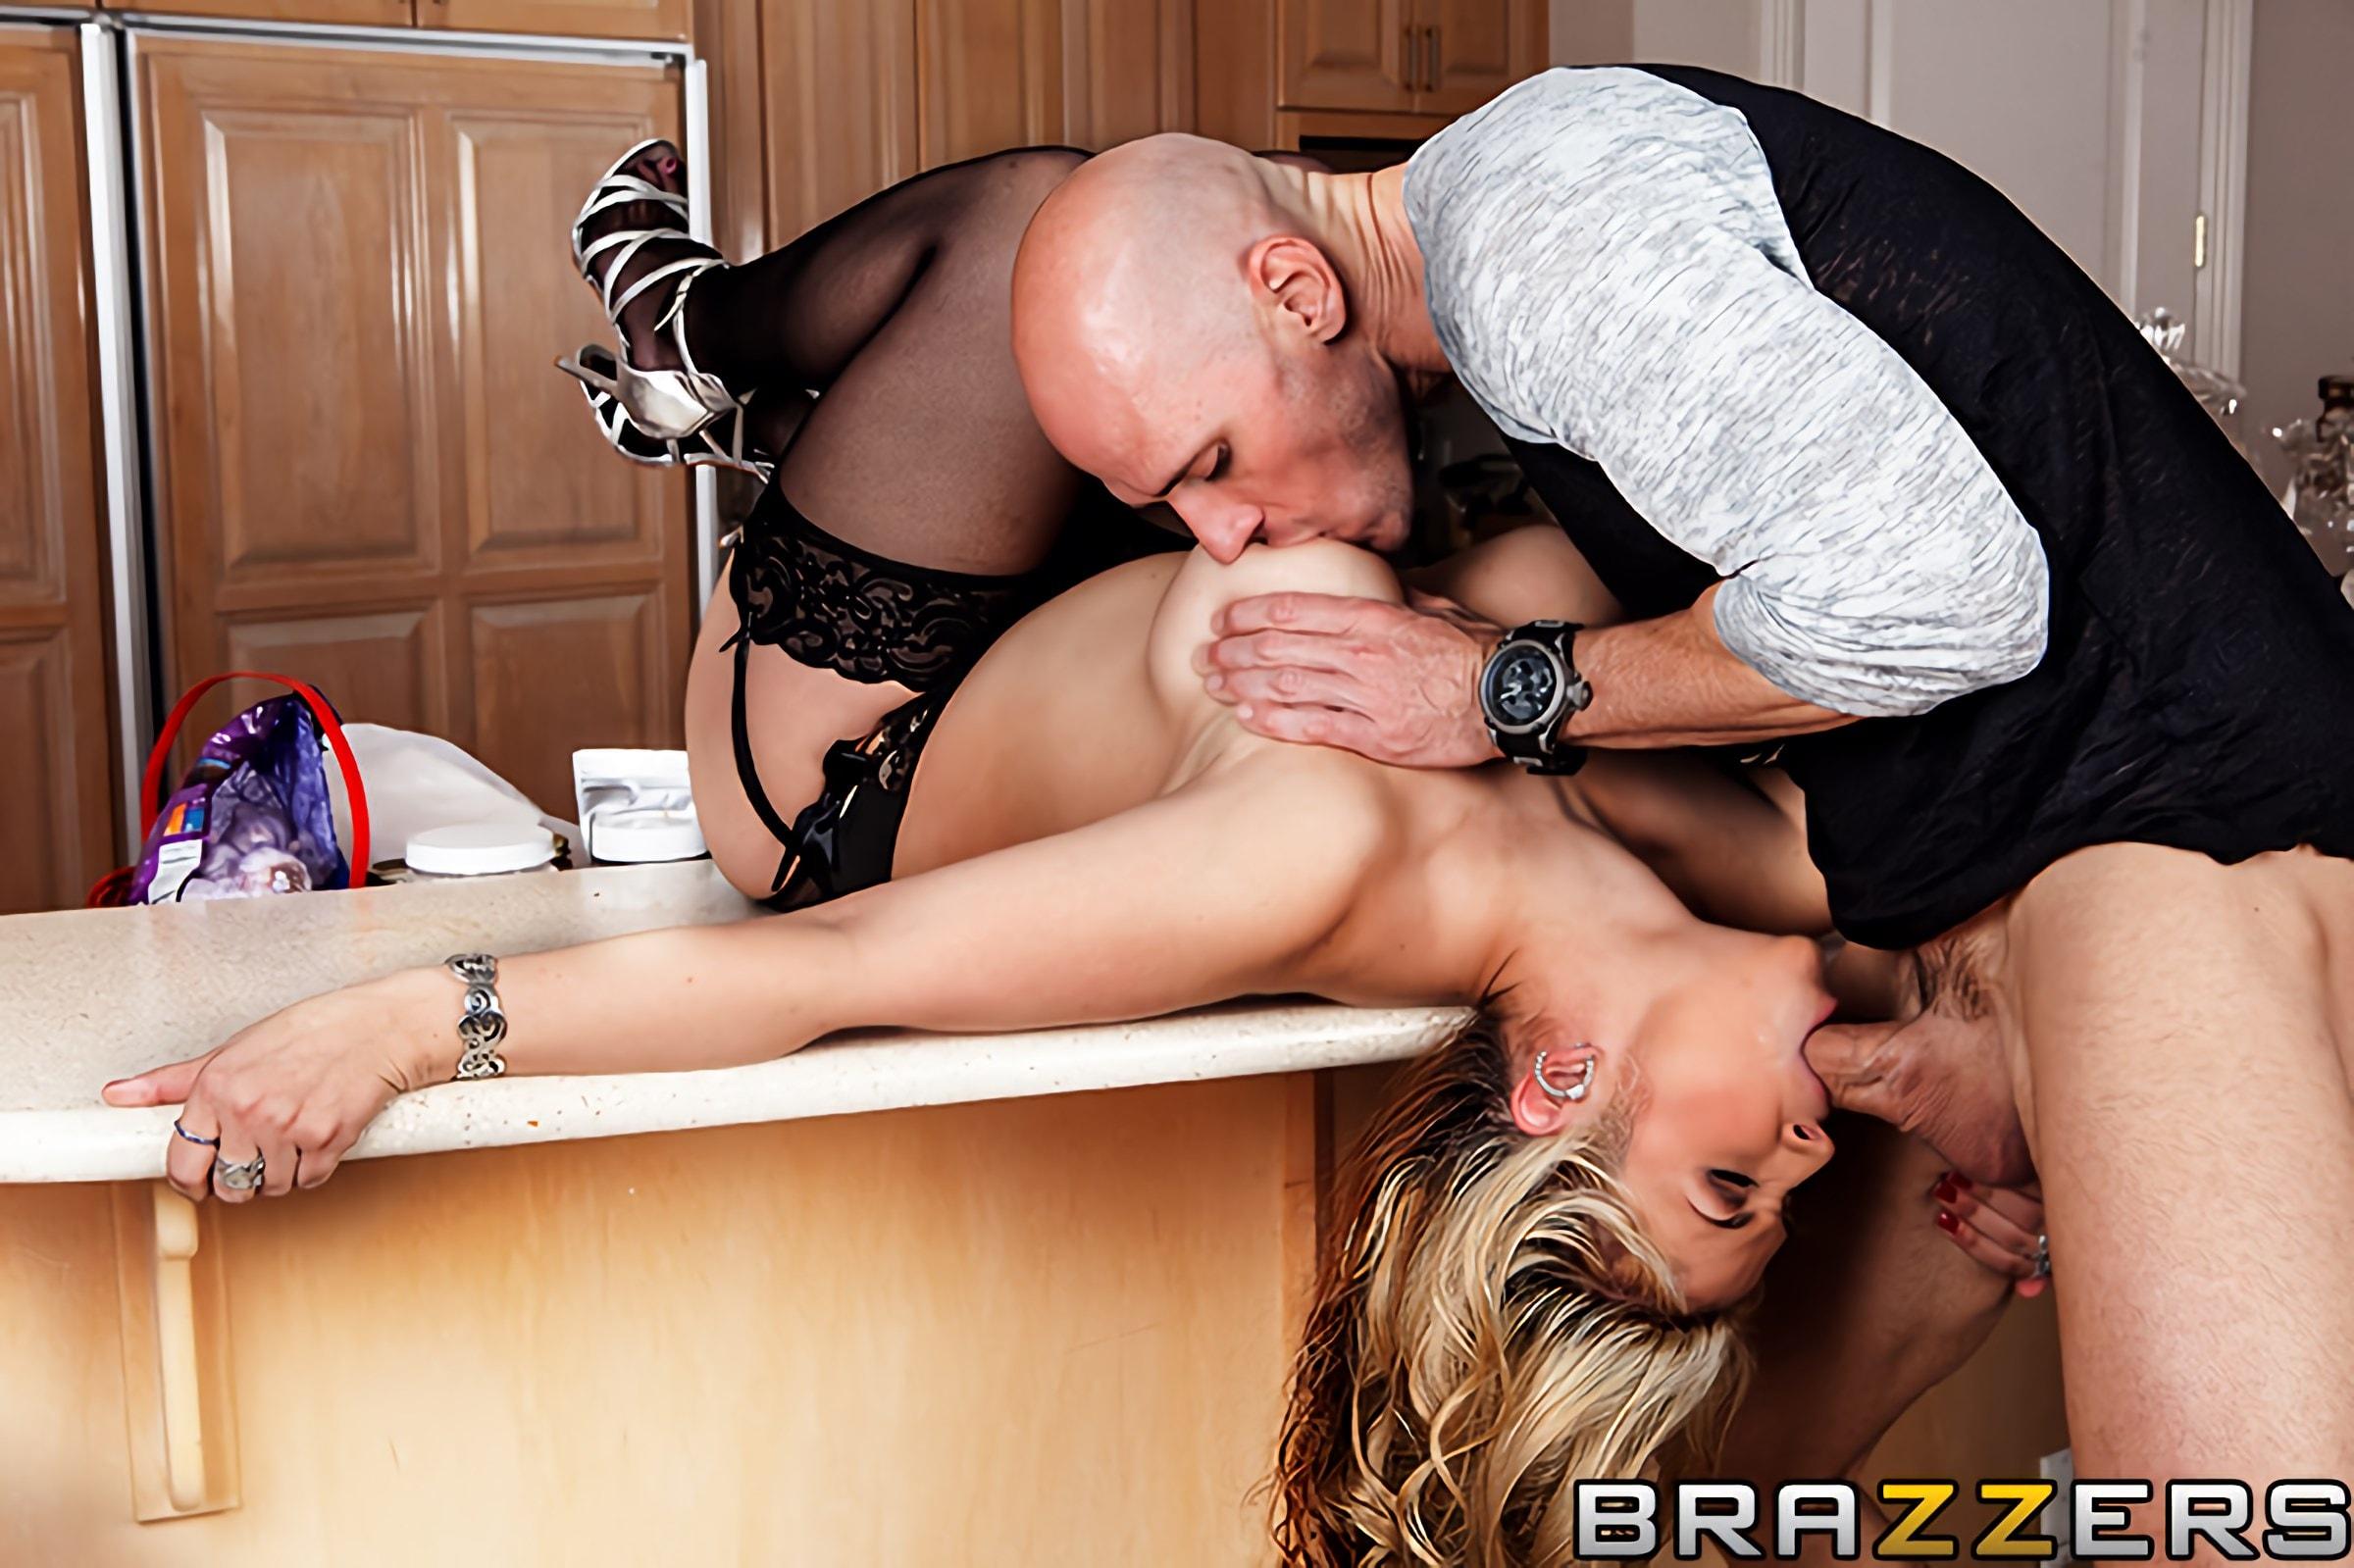 Amateur blonde wife pleasures husband friend